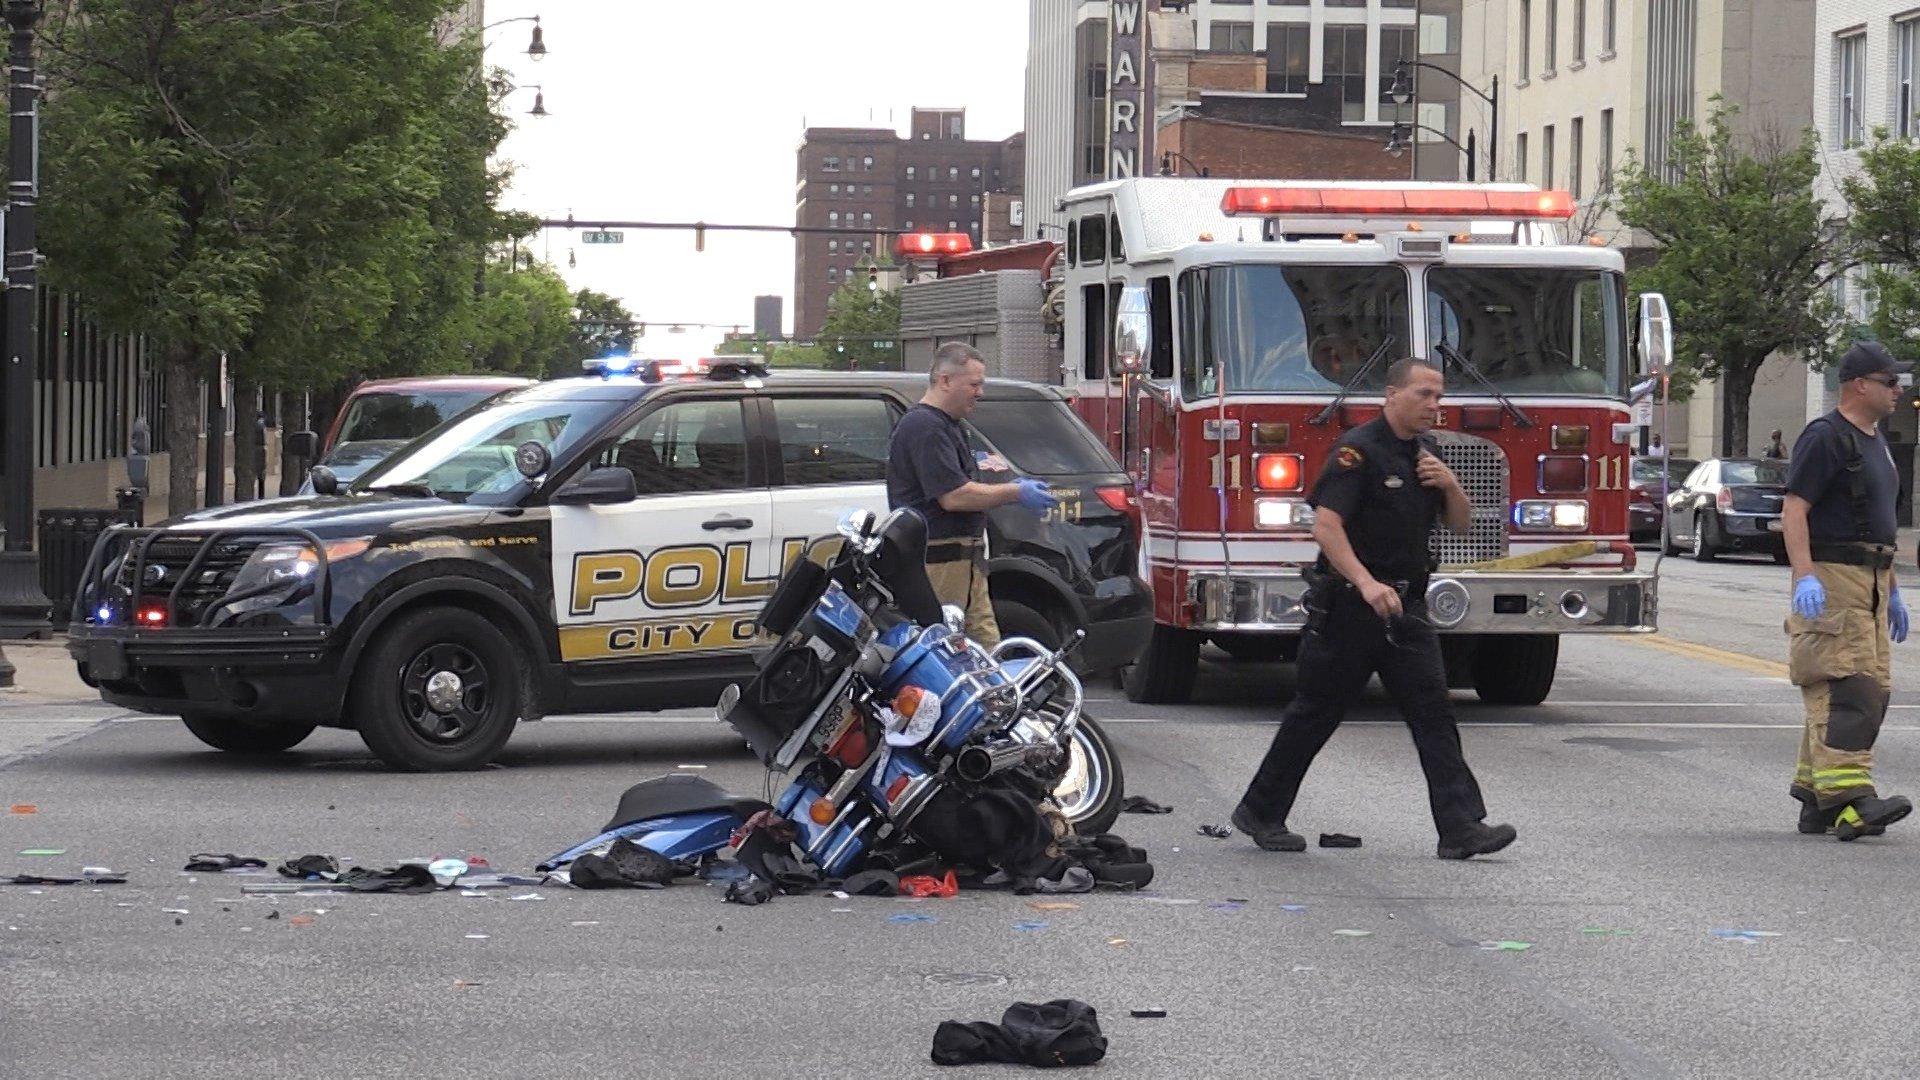 Colorado Traffic Cameras >> Motorcyclist Hurt in Accident Last Thursday Dies at ...